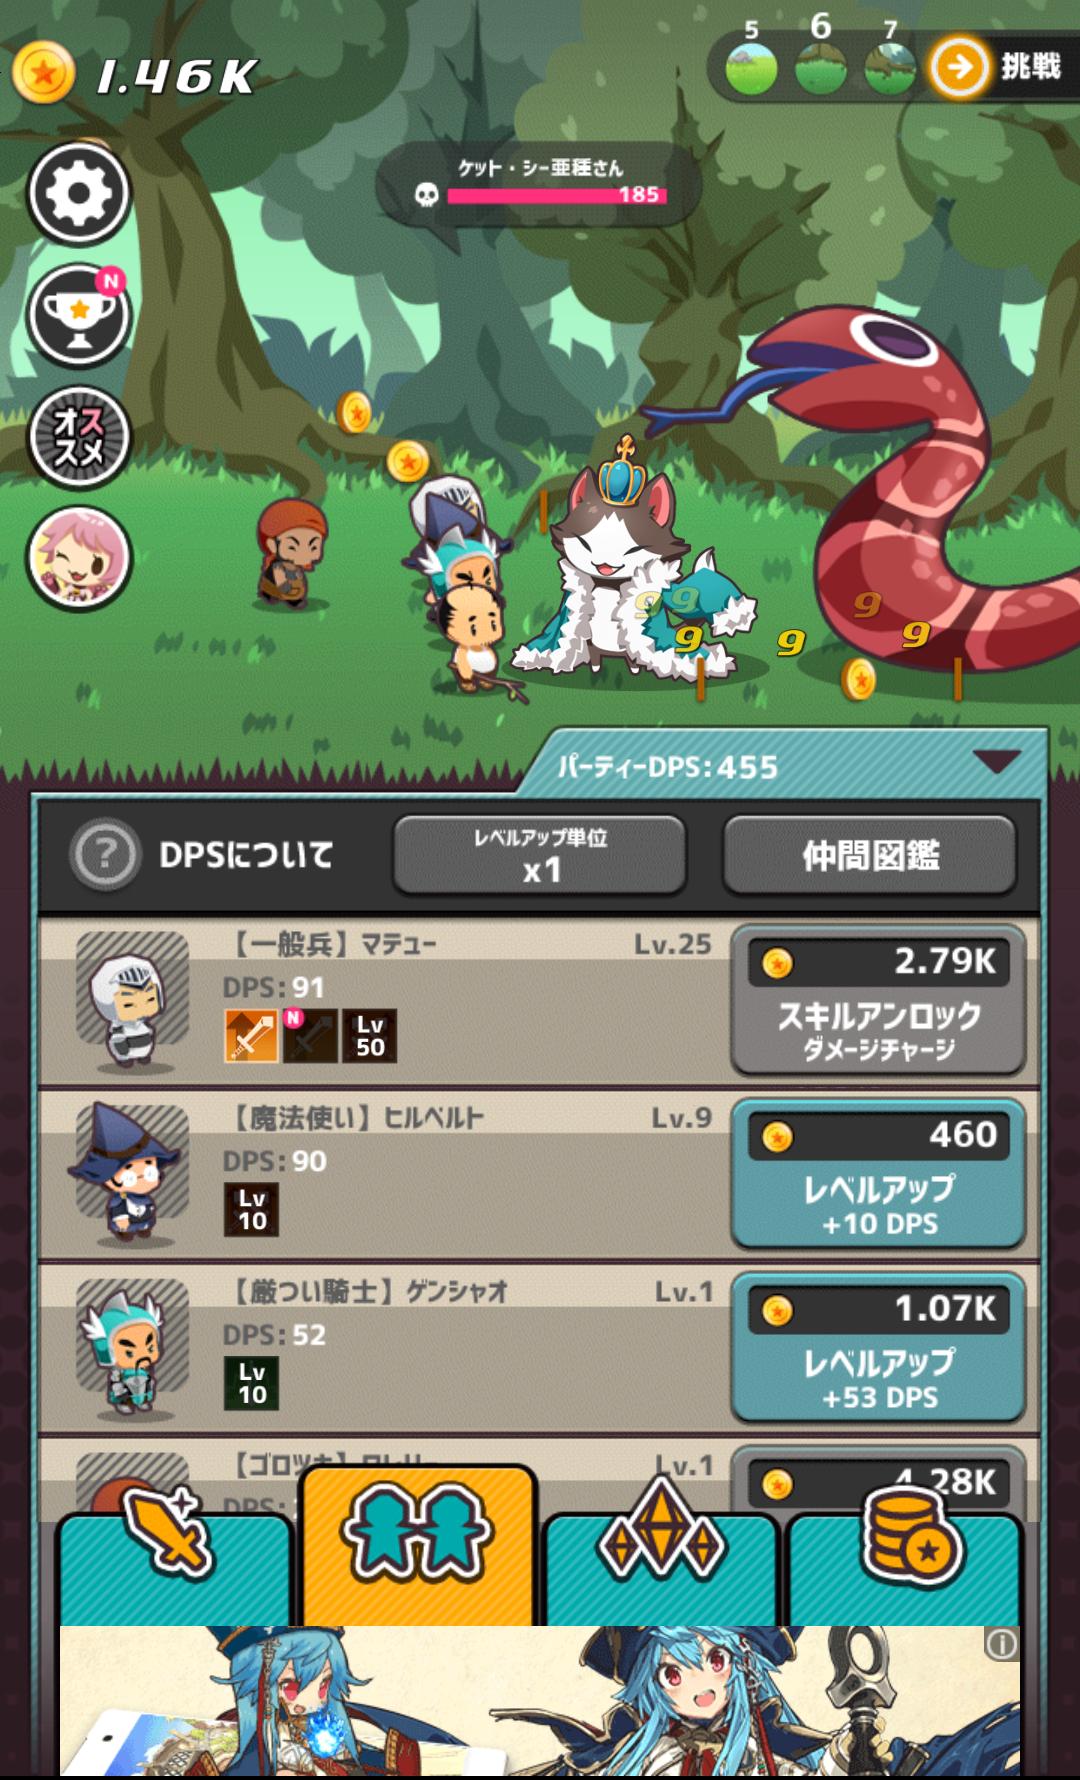 androidアプリ おじクエ - OJISAN QUEST -攻略スクリーンショット3